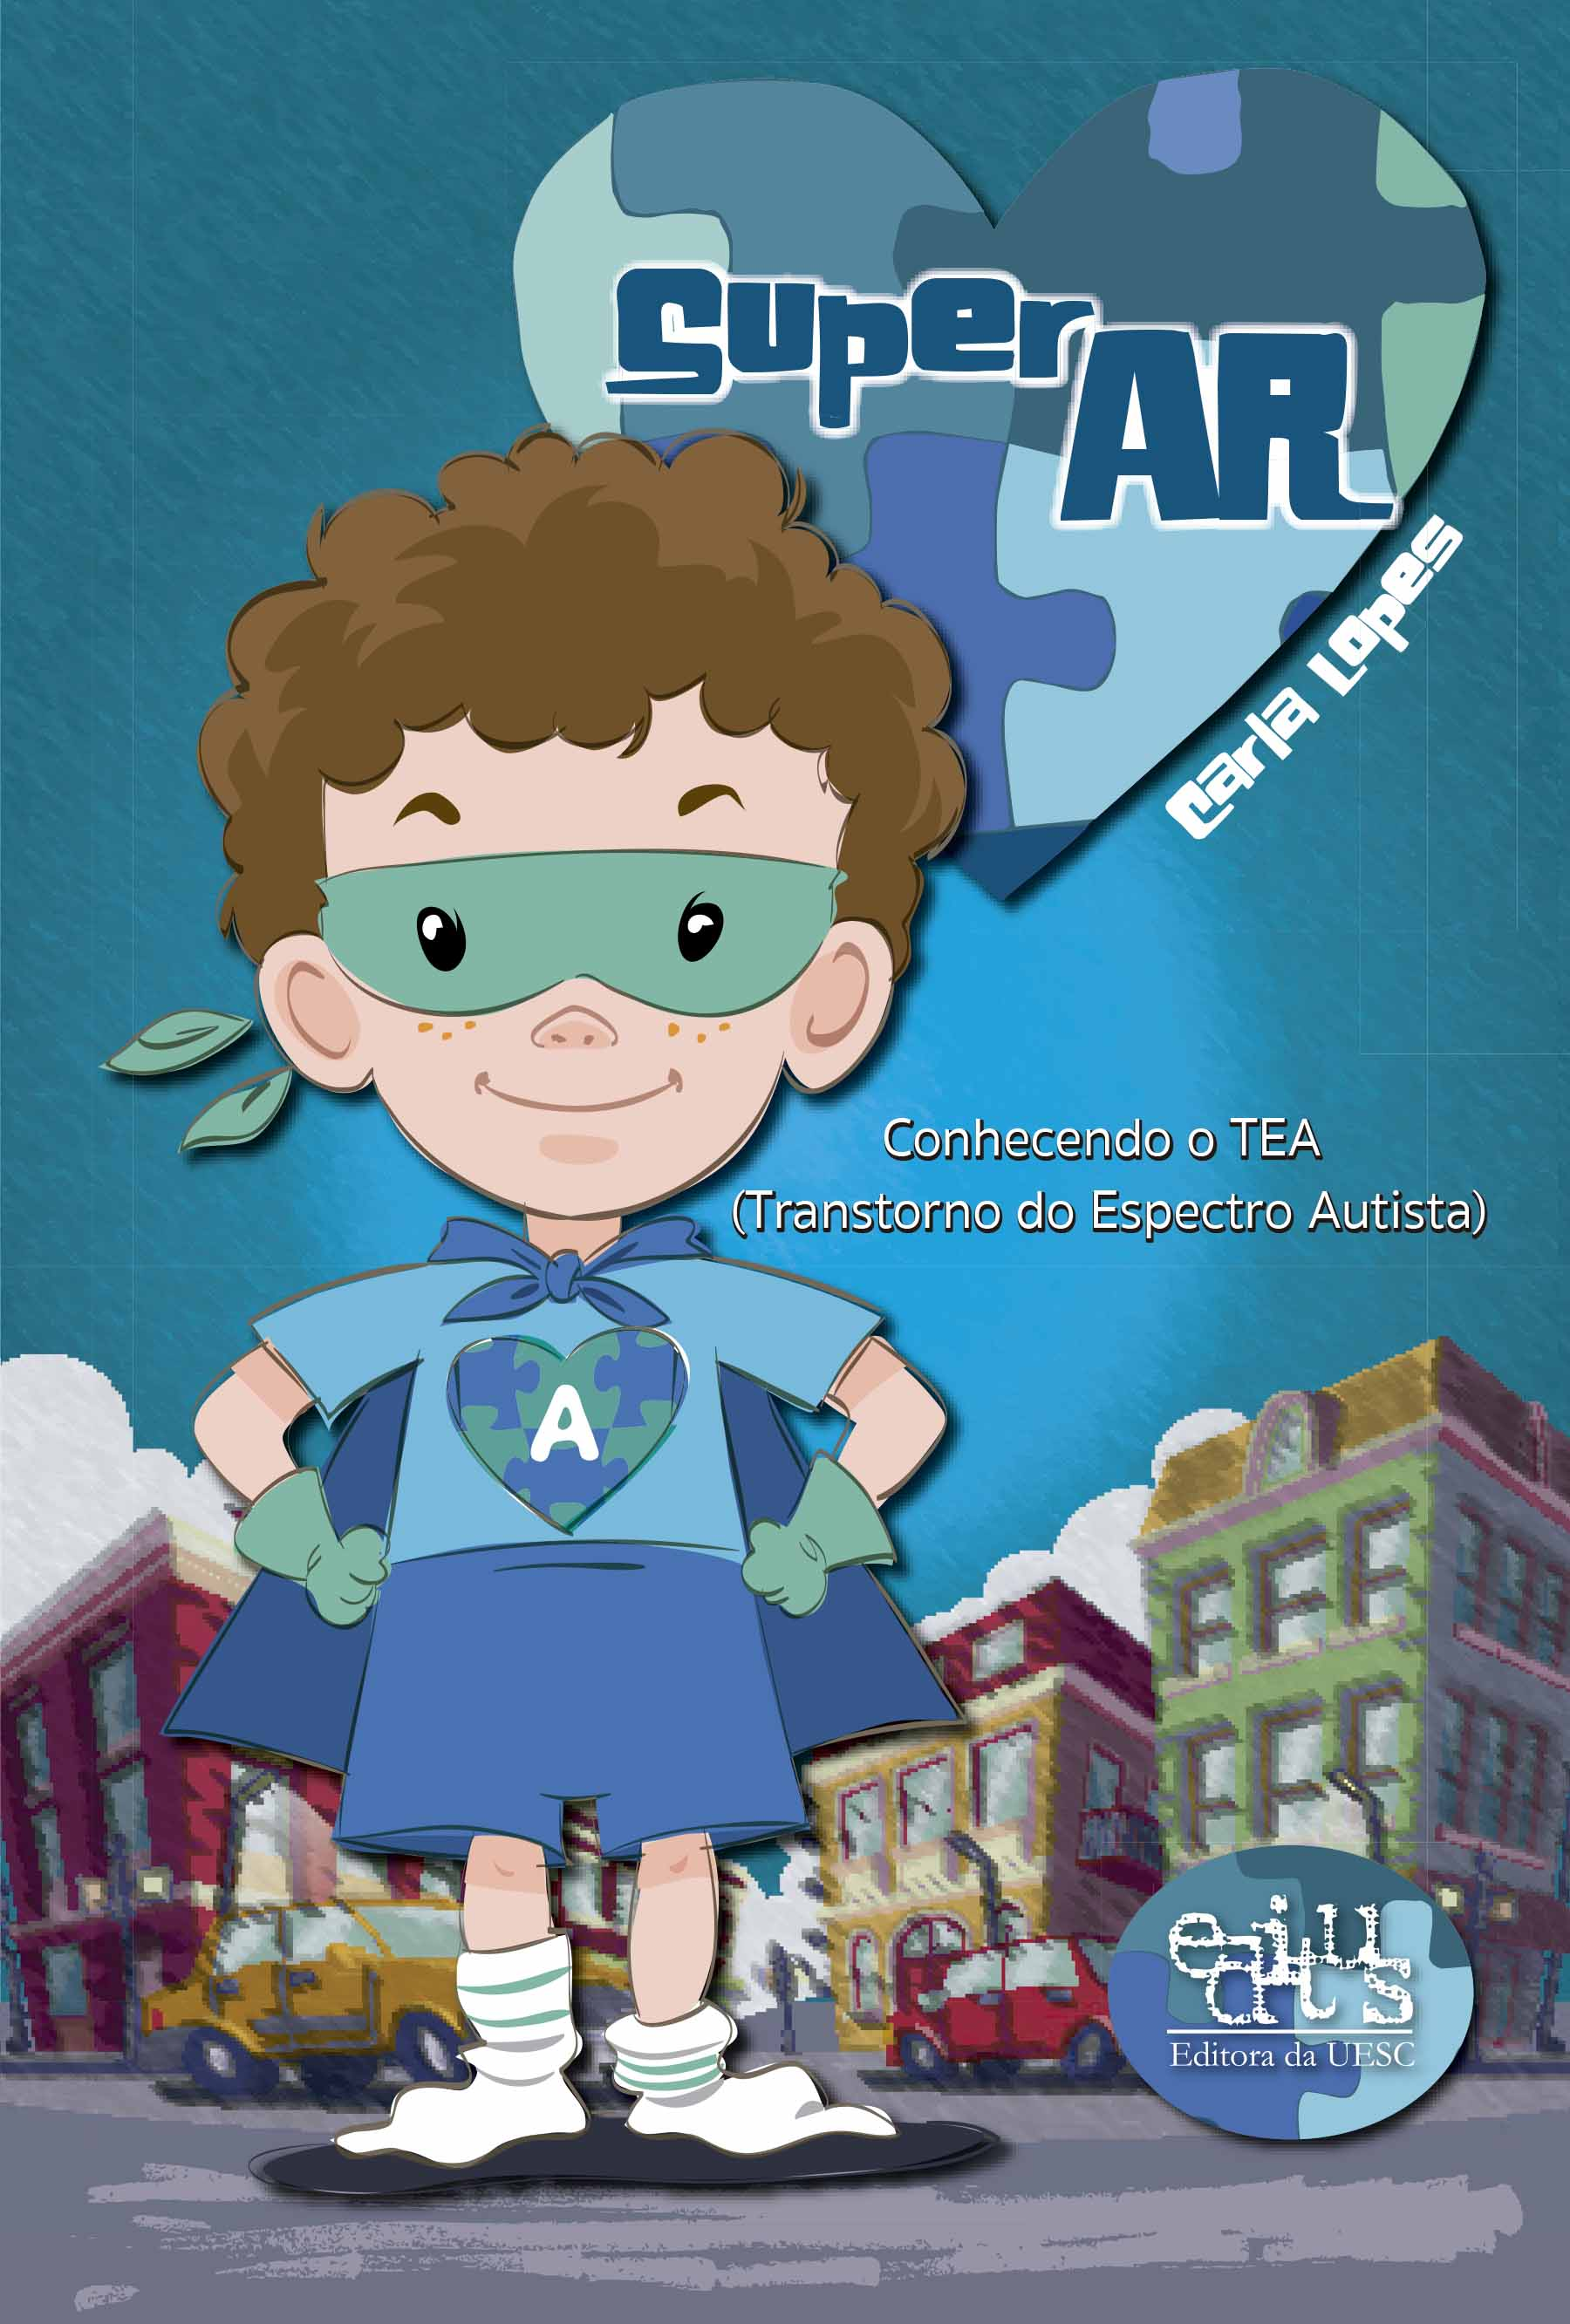 SuperAR. Conhecendo o TEA (Transtorno do Espectro Autista), livro de Carla Lopes